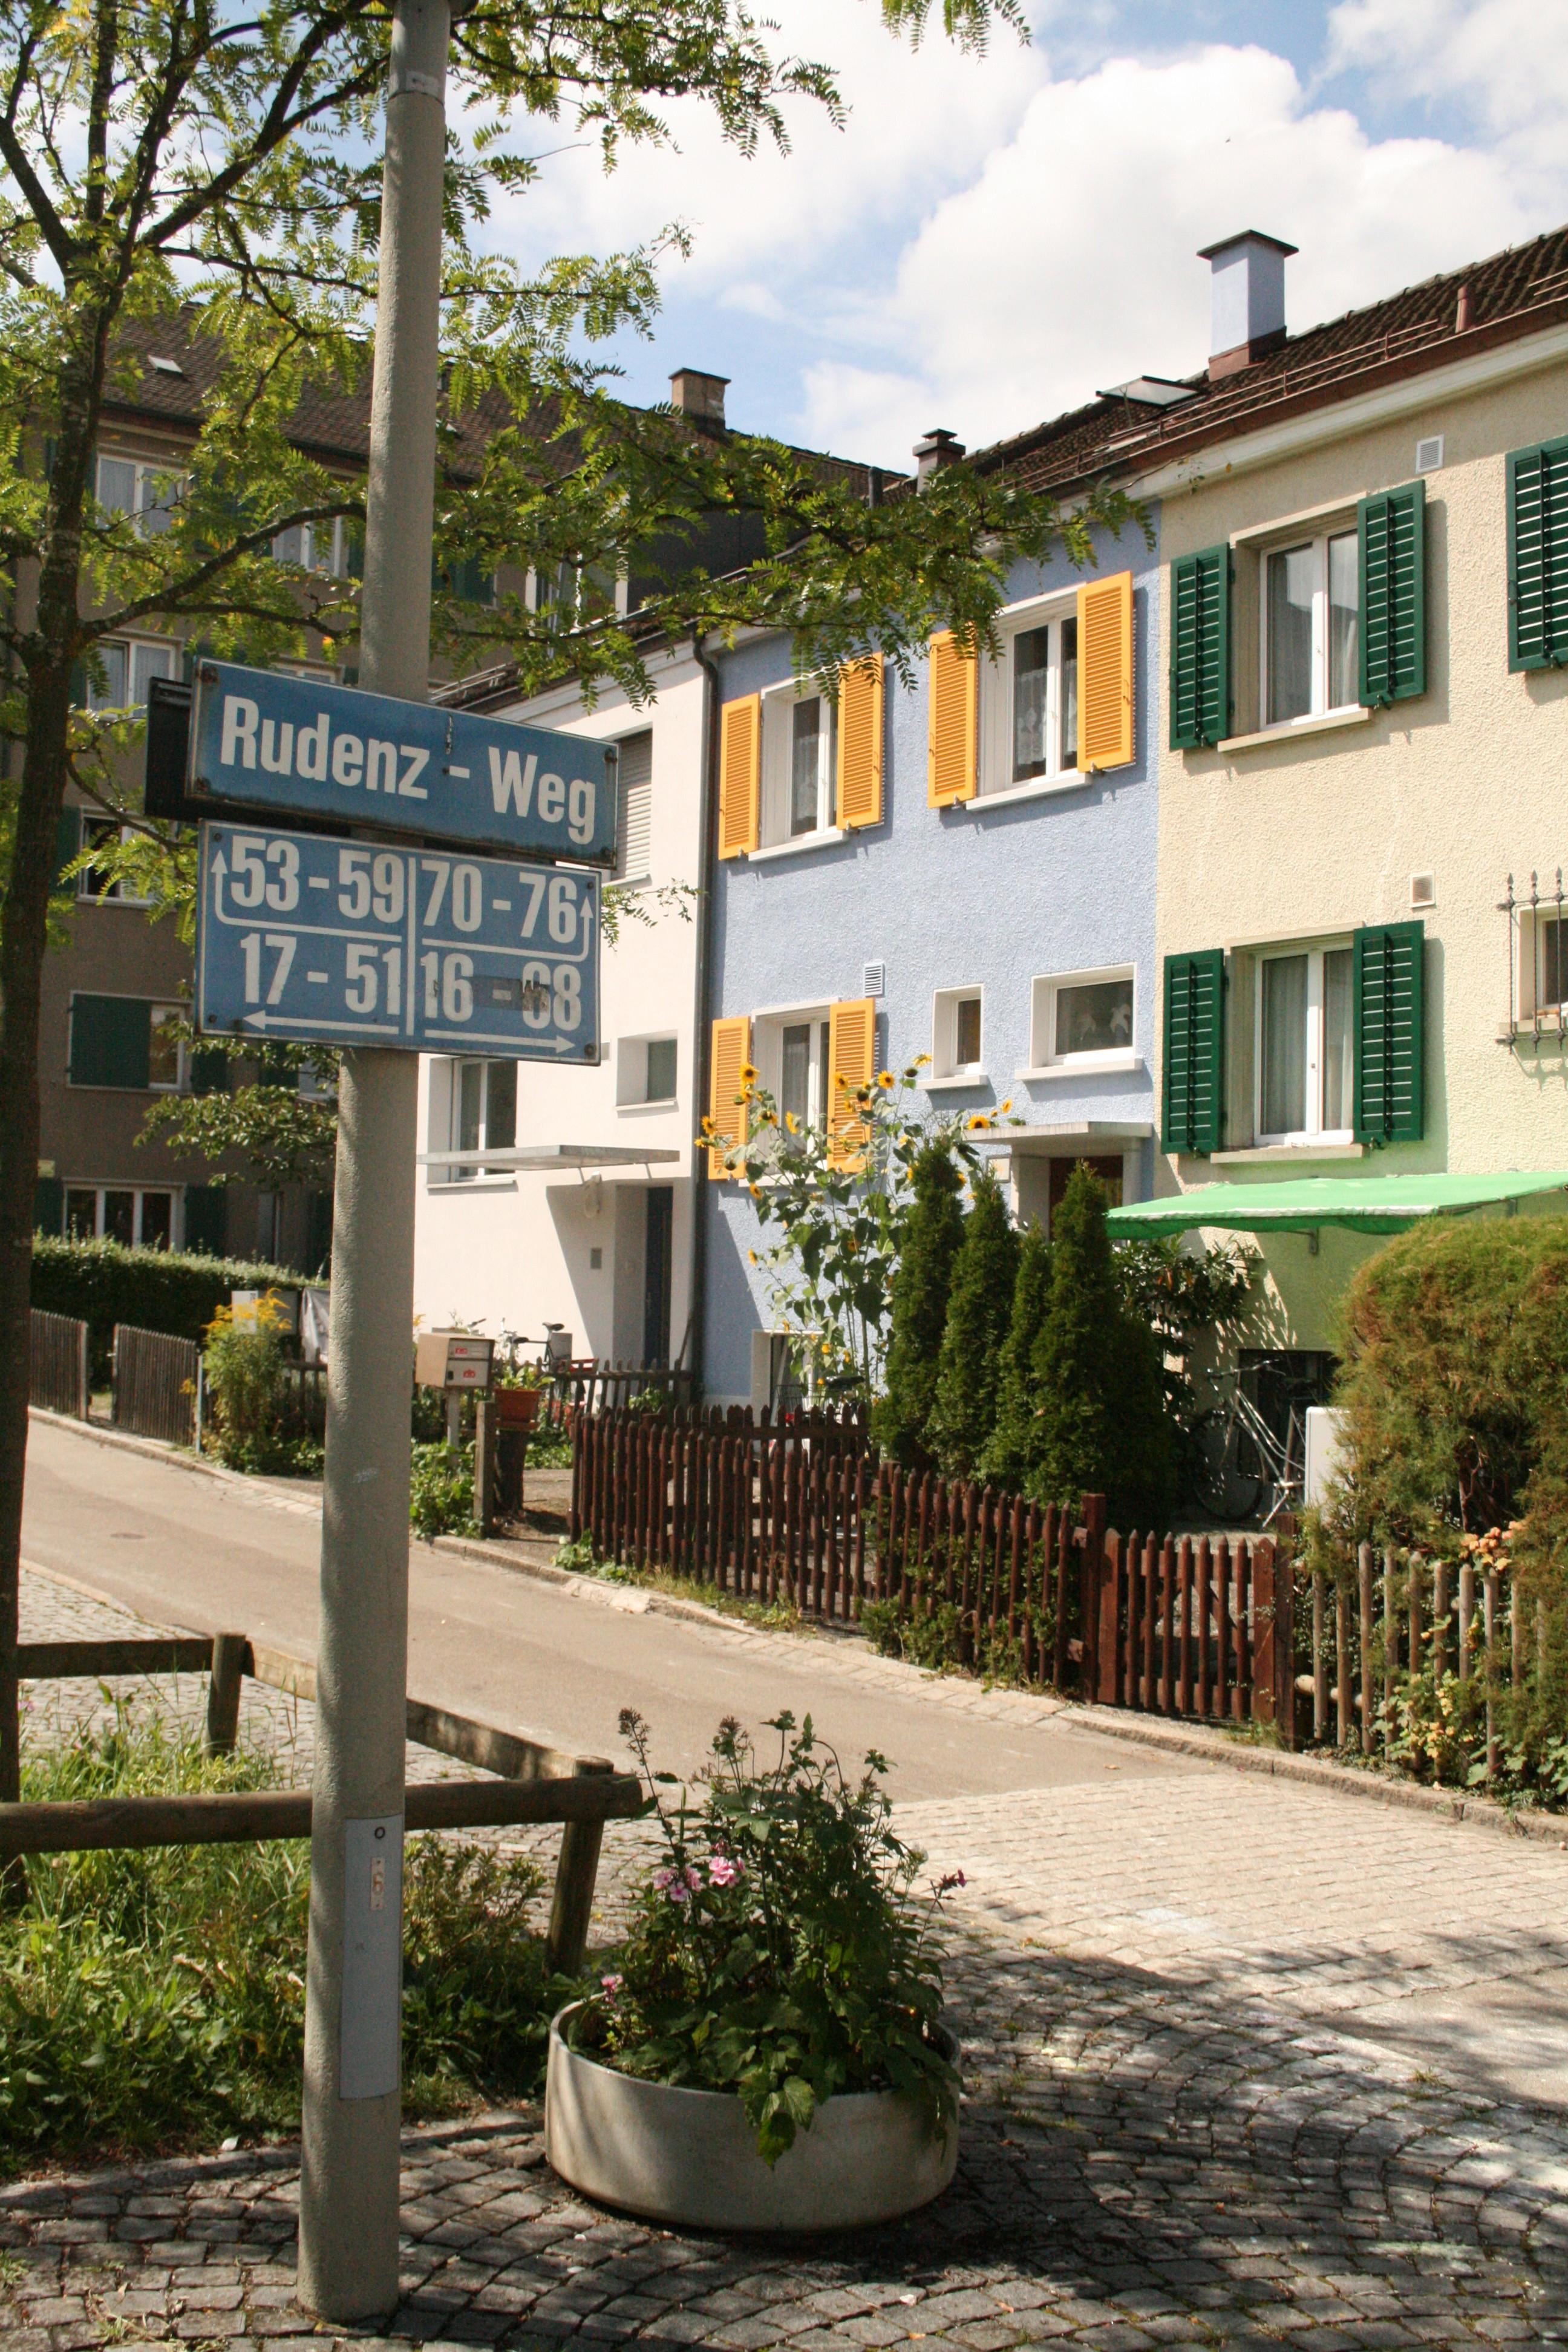 Weg, Quartierstrasse, Rudenz - Weg